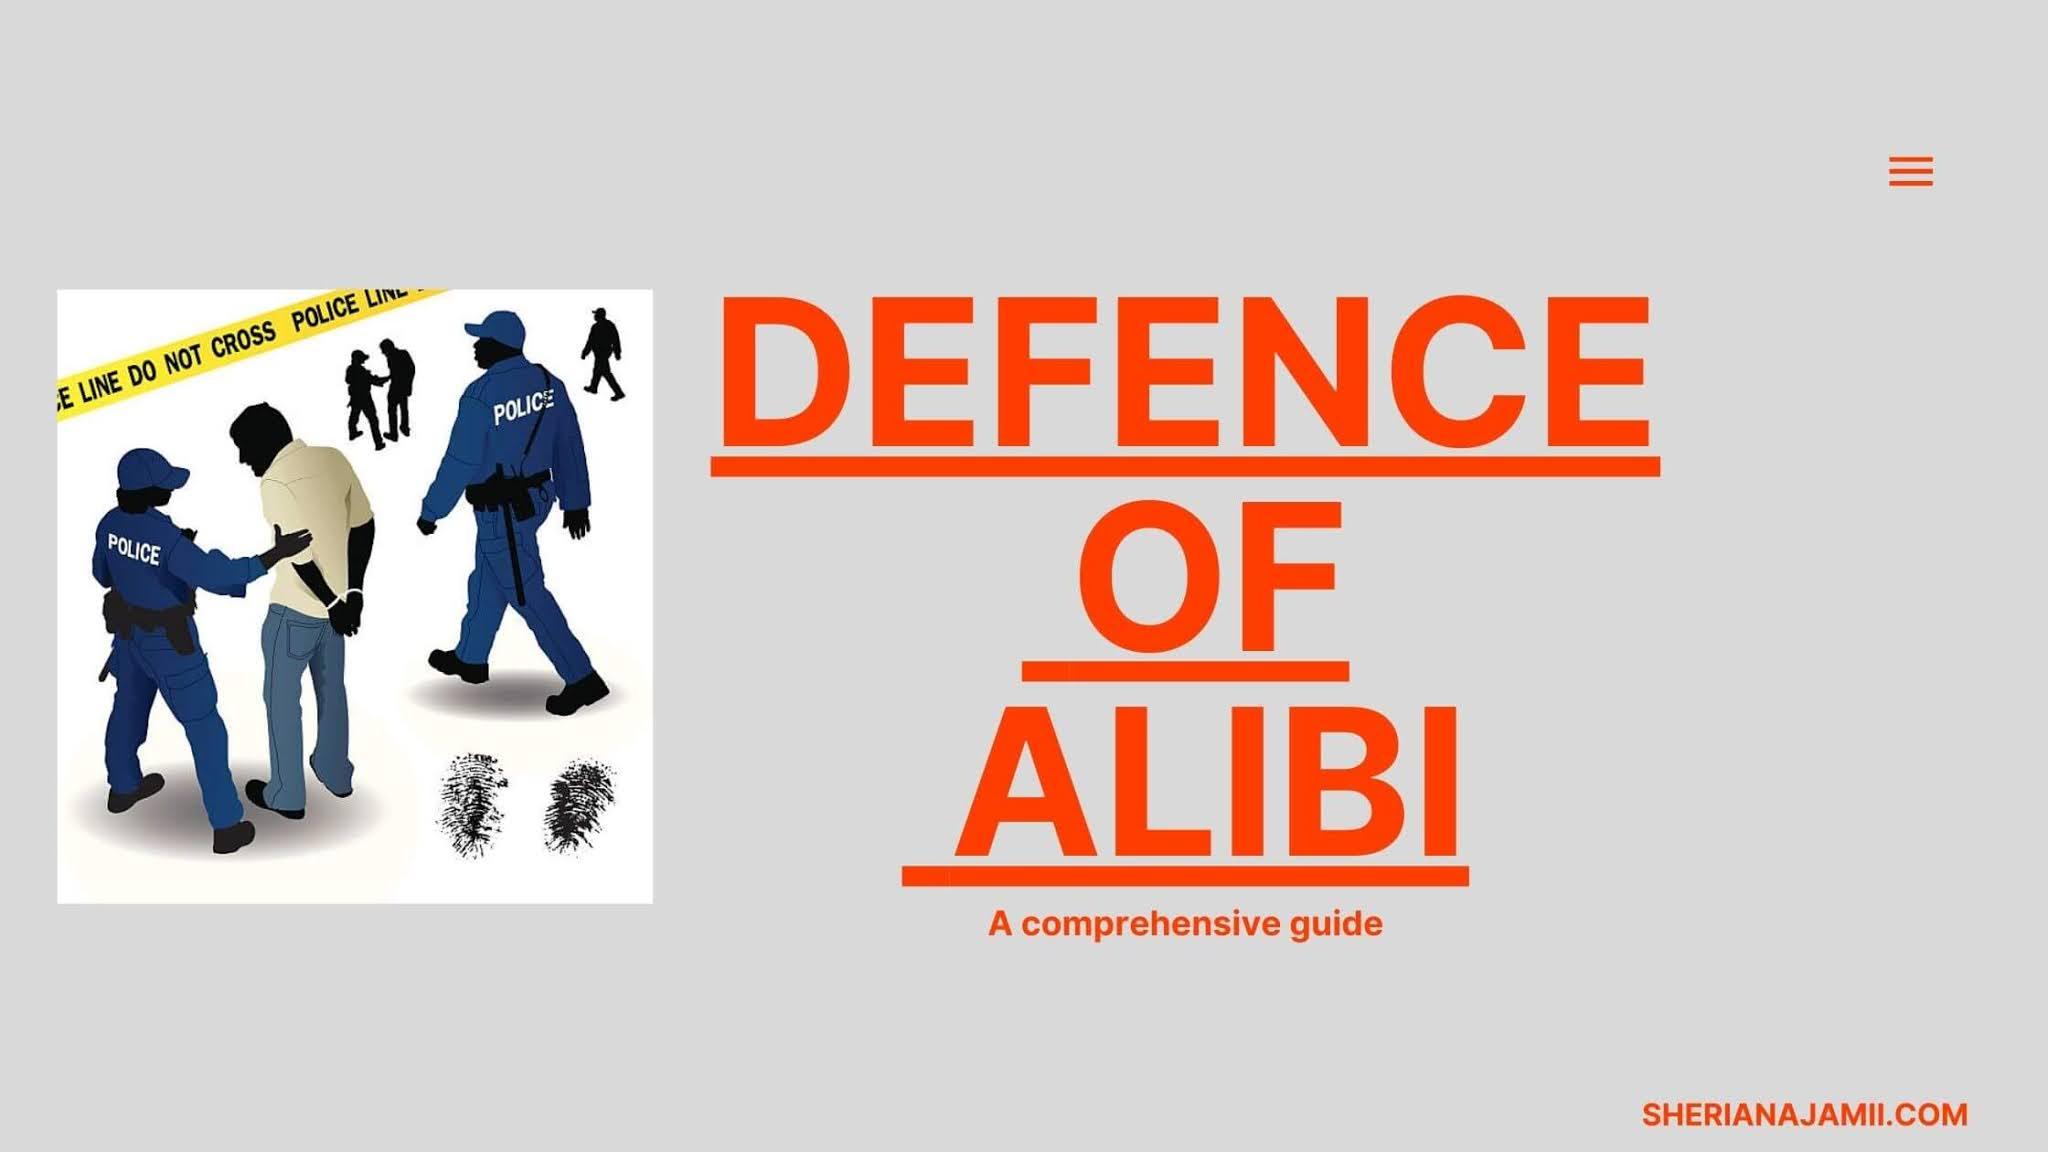 Defence of alibi, plea of alibi, how to raise defence of alibi